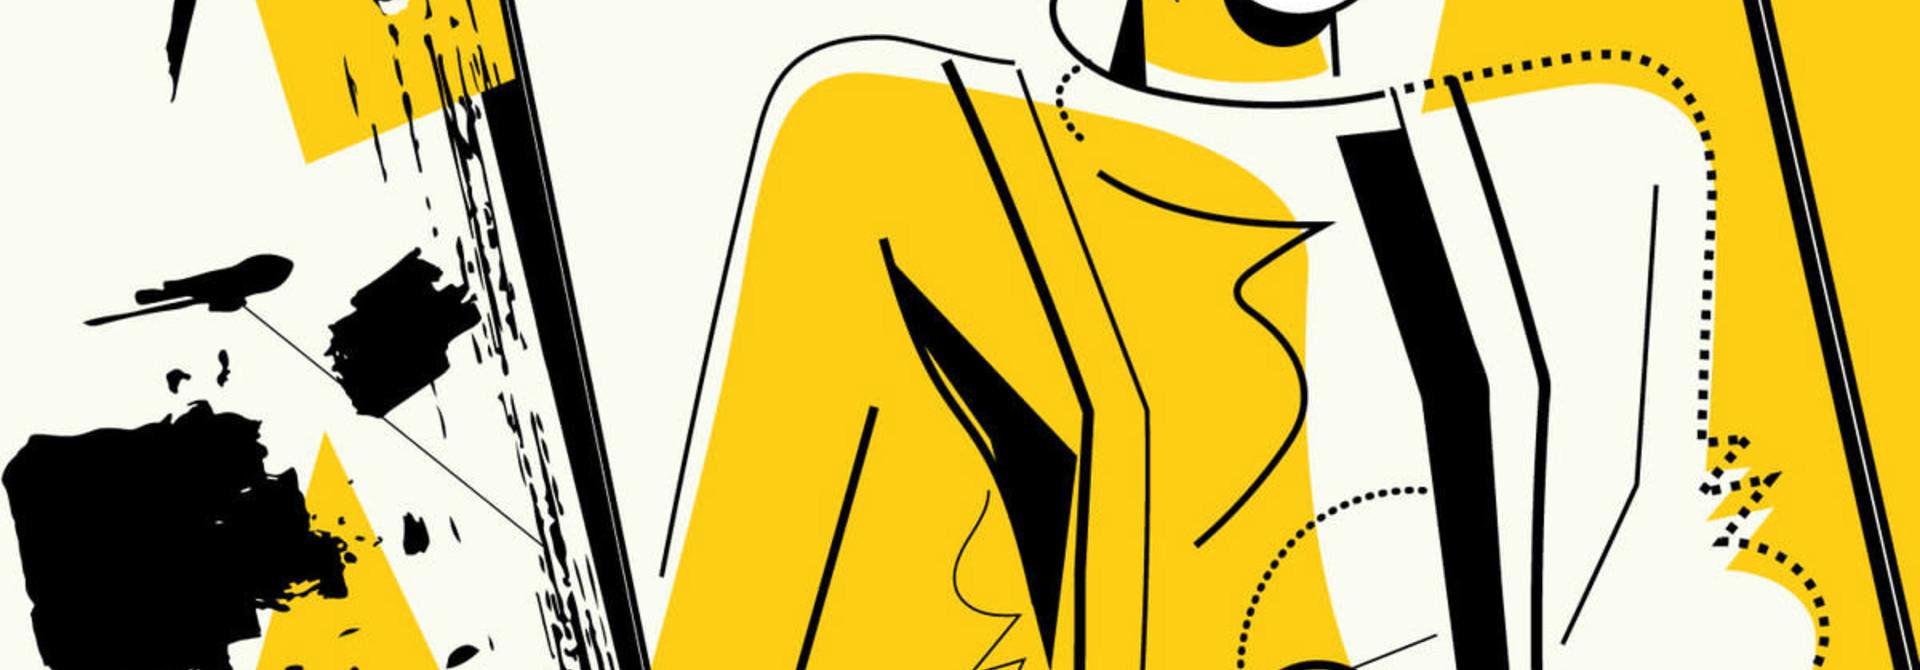 Artistes Variés • Gumba Fire (Bubblegum Soul & Synth-Boogie In 1980s South Africa, 3LP)